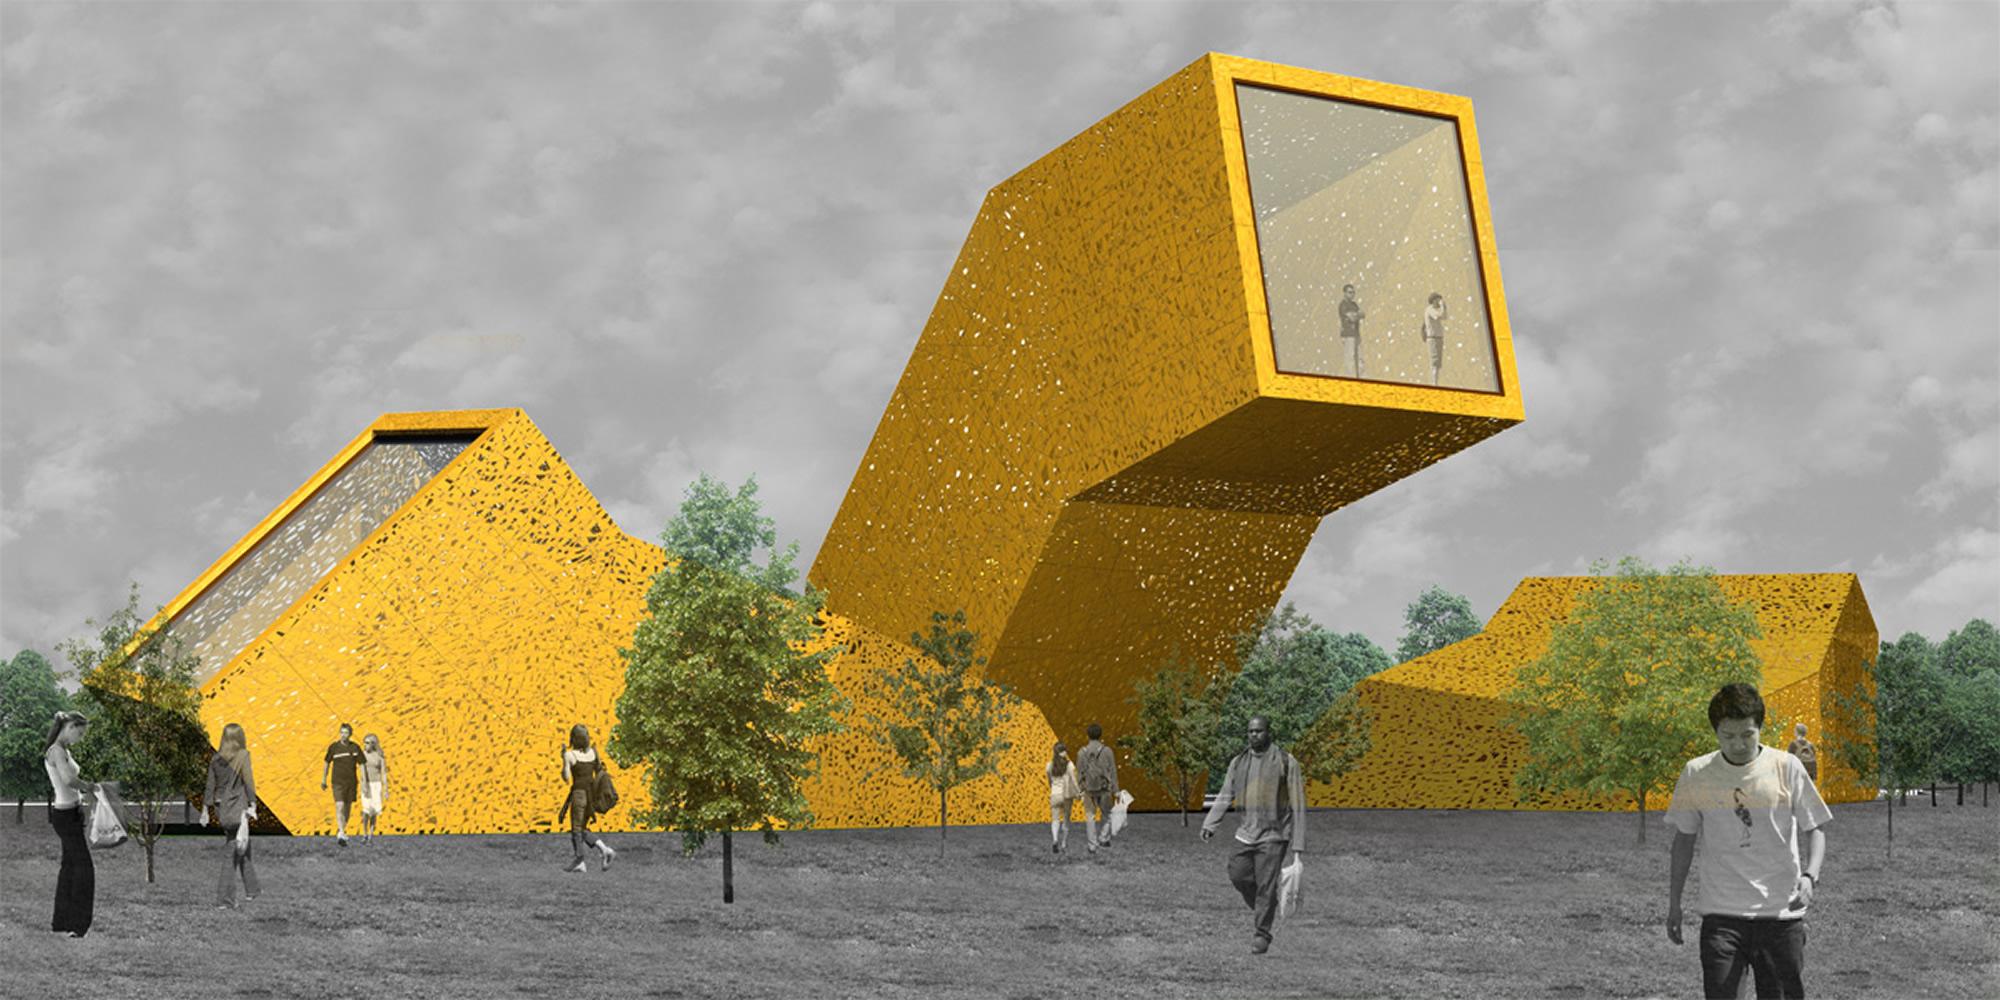 A winning architectural design